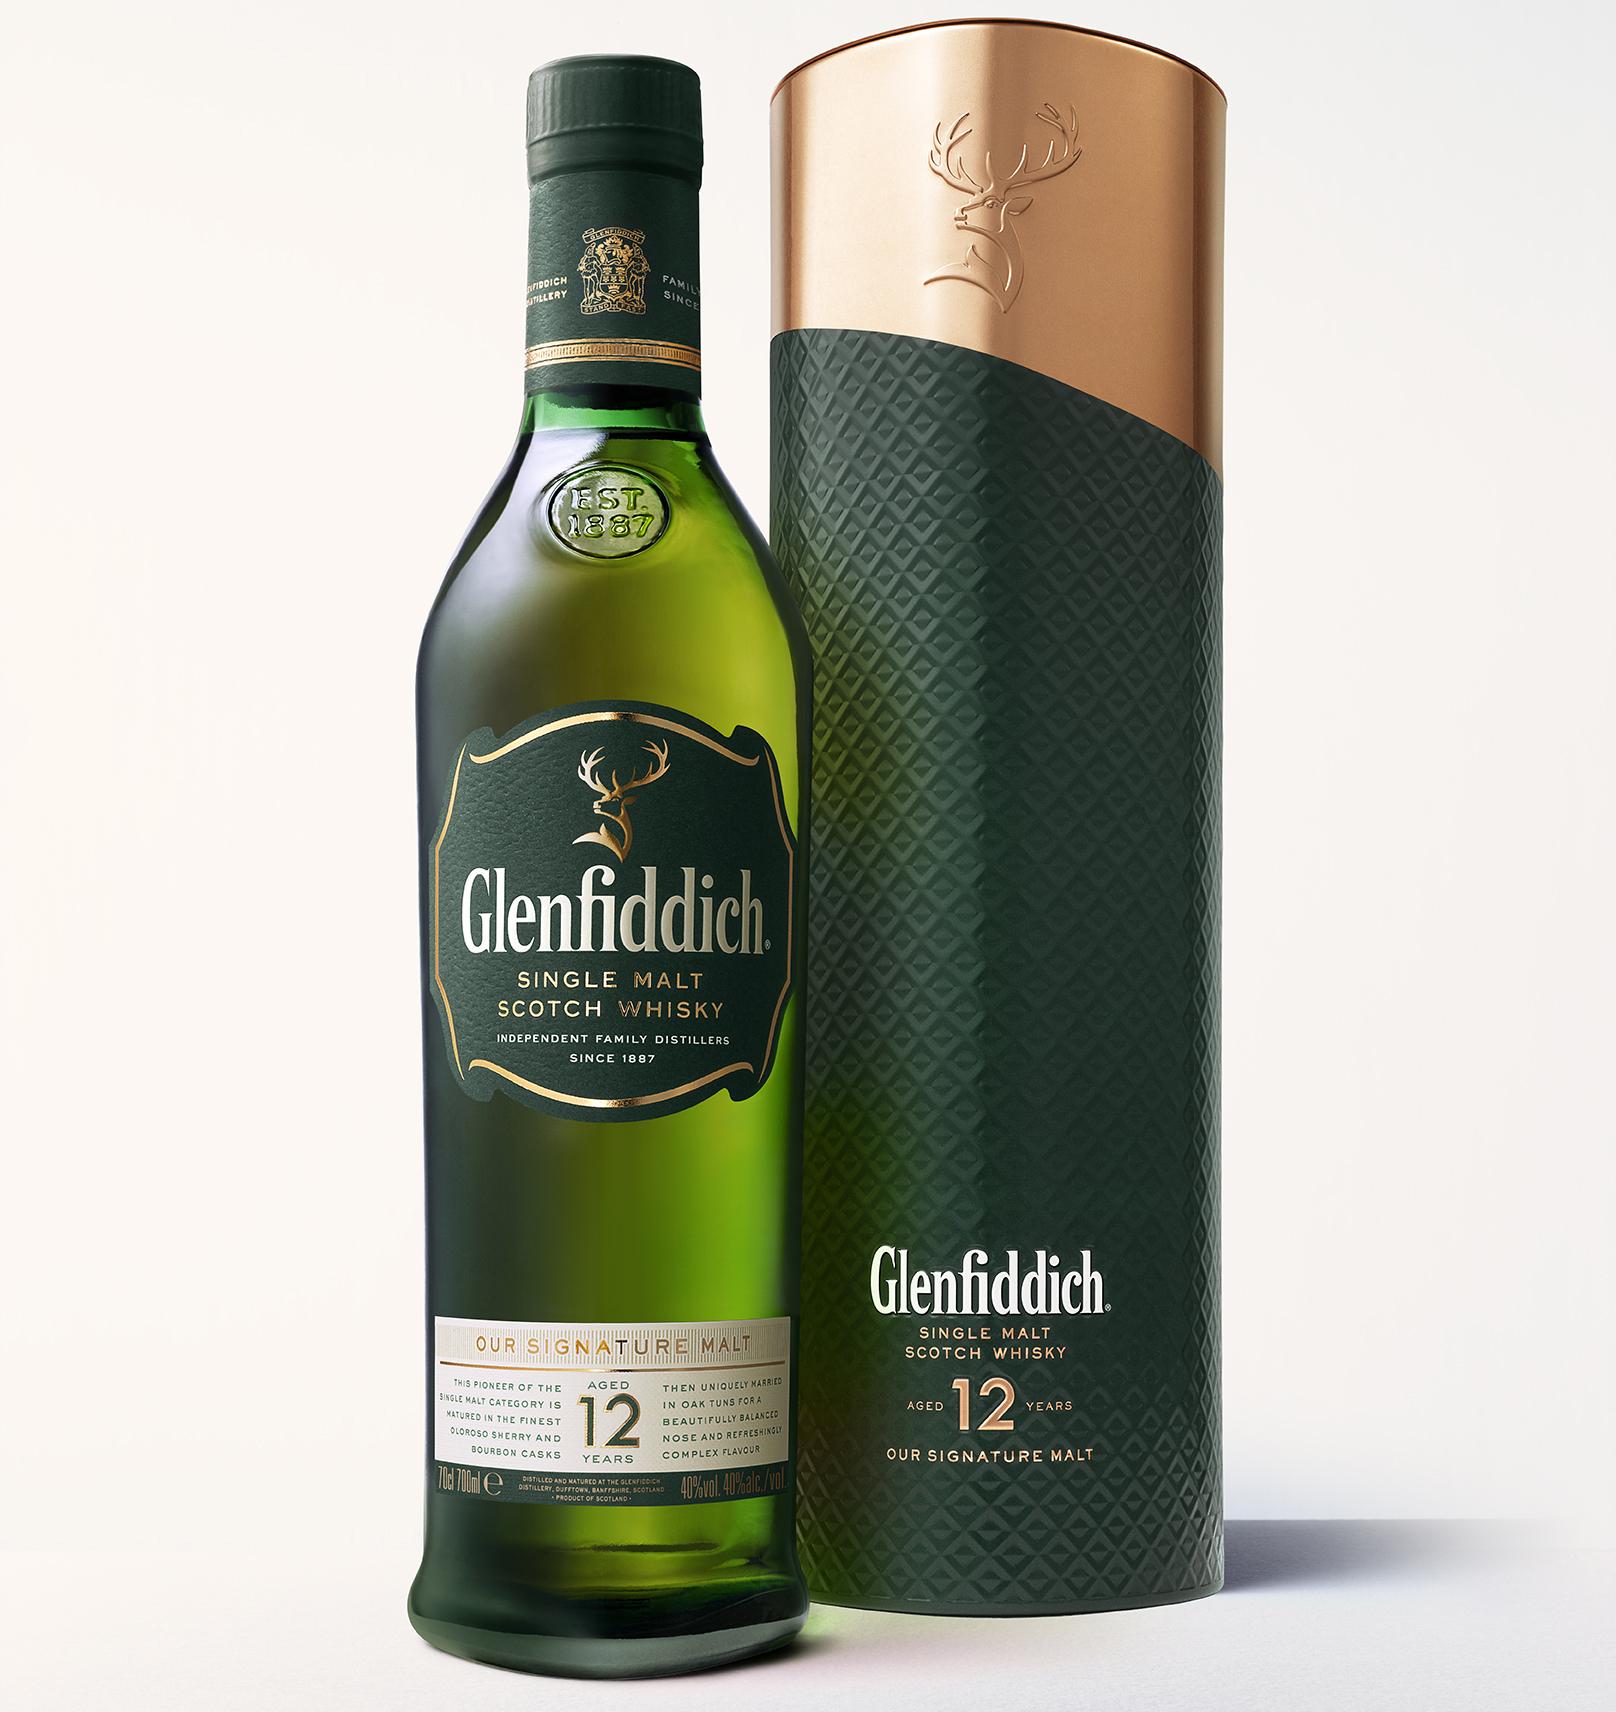 Glenfiddich GF_12_BOTTLE_TIN.jpg (1)